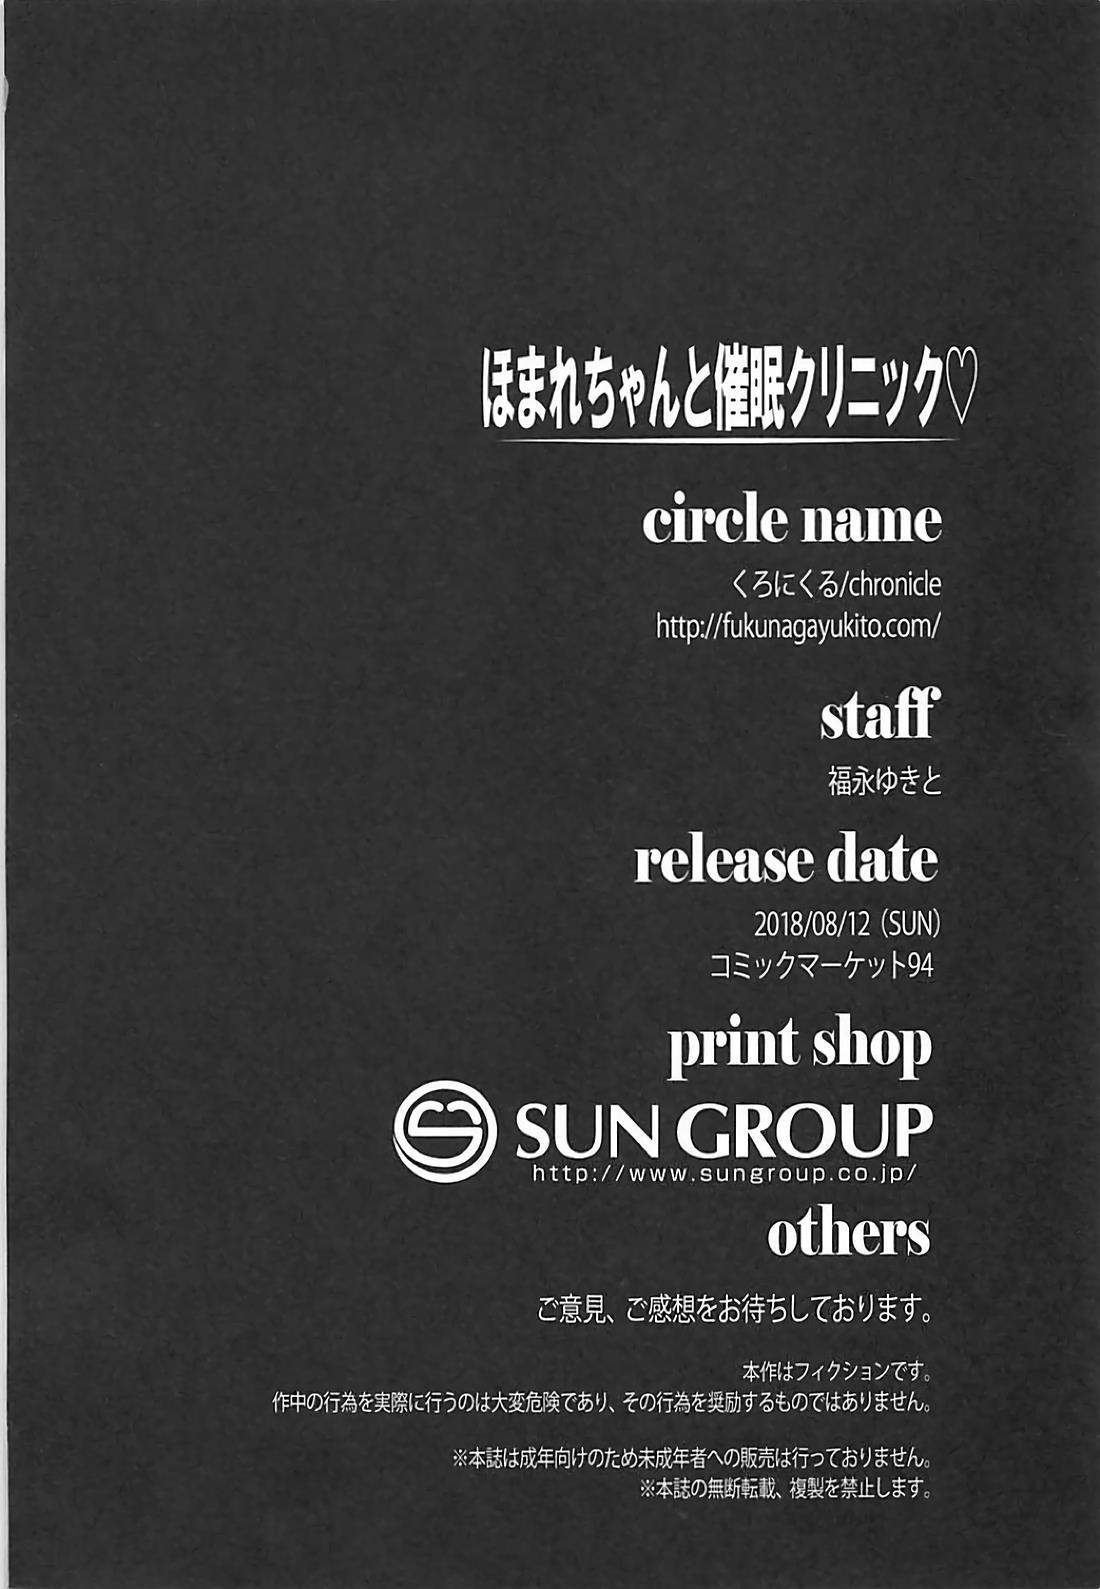 Homare-chan to Saimin Clinic 24